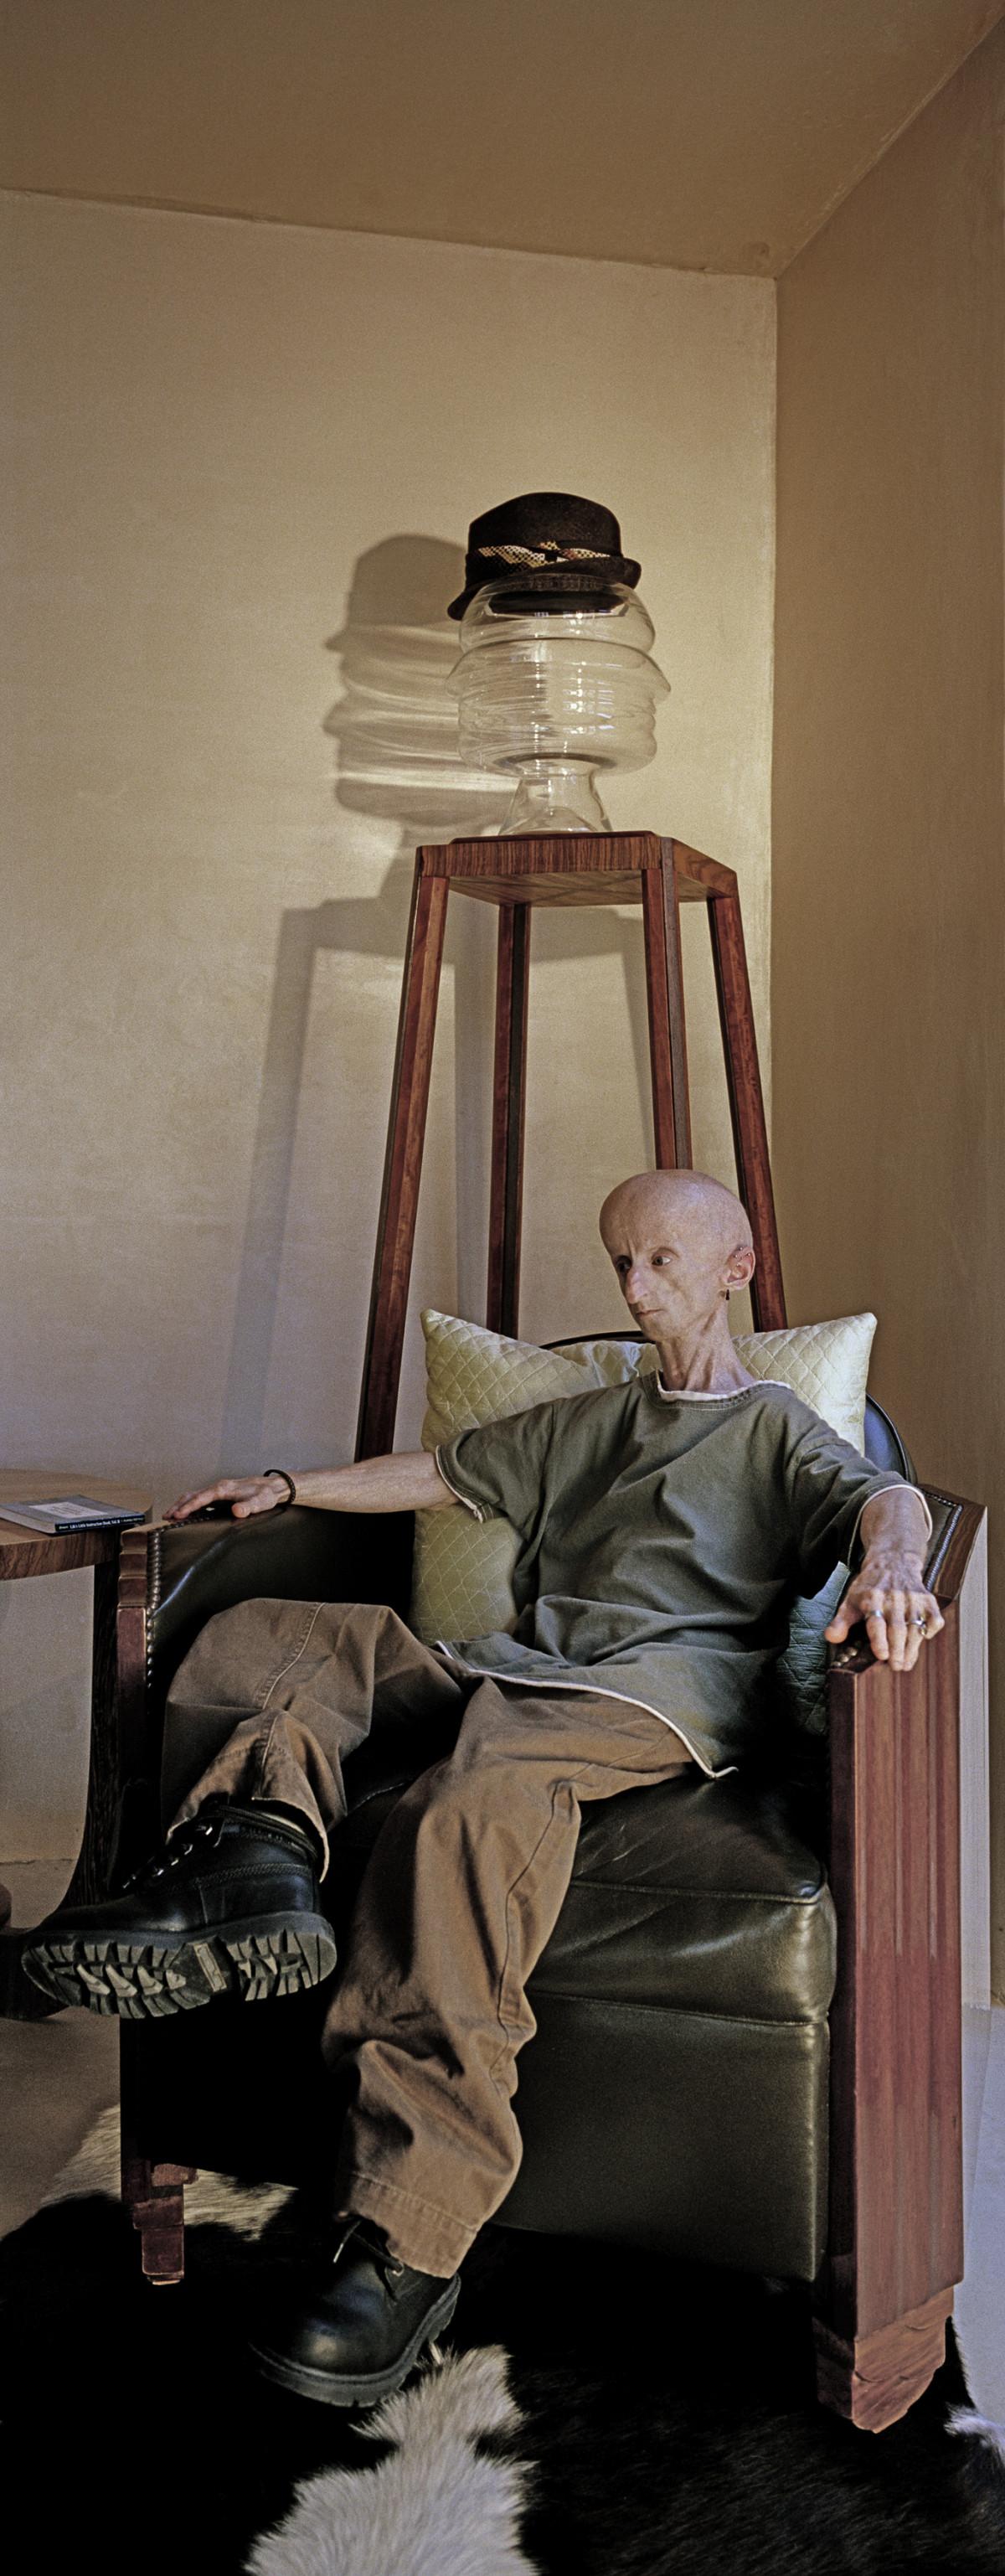 Gordon Clark, STEREOTYPE, 2009